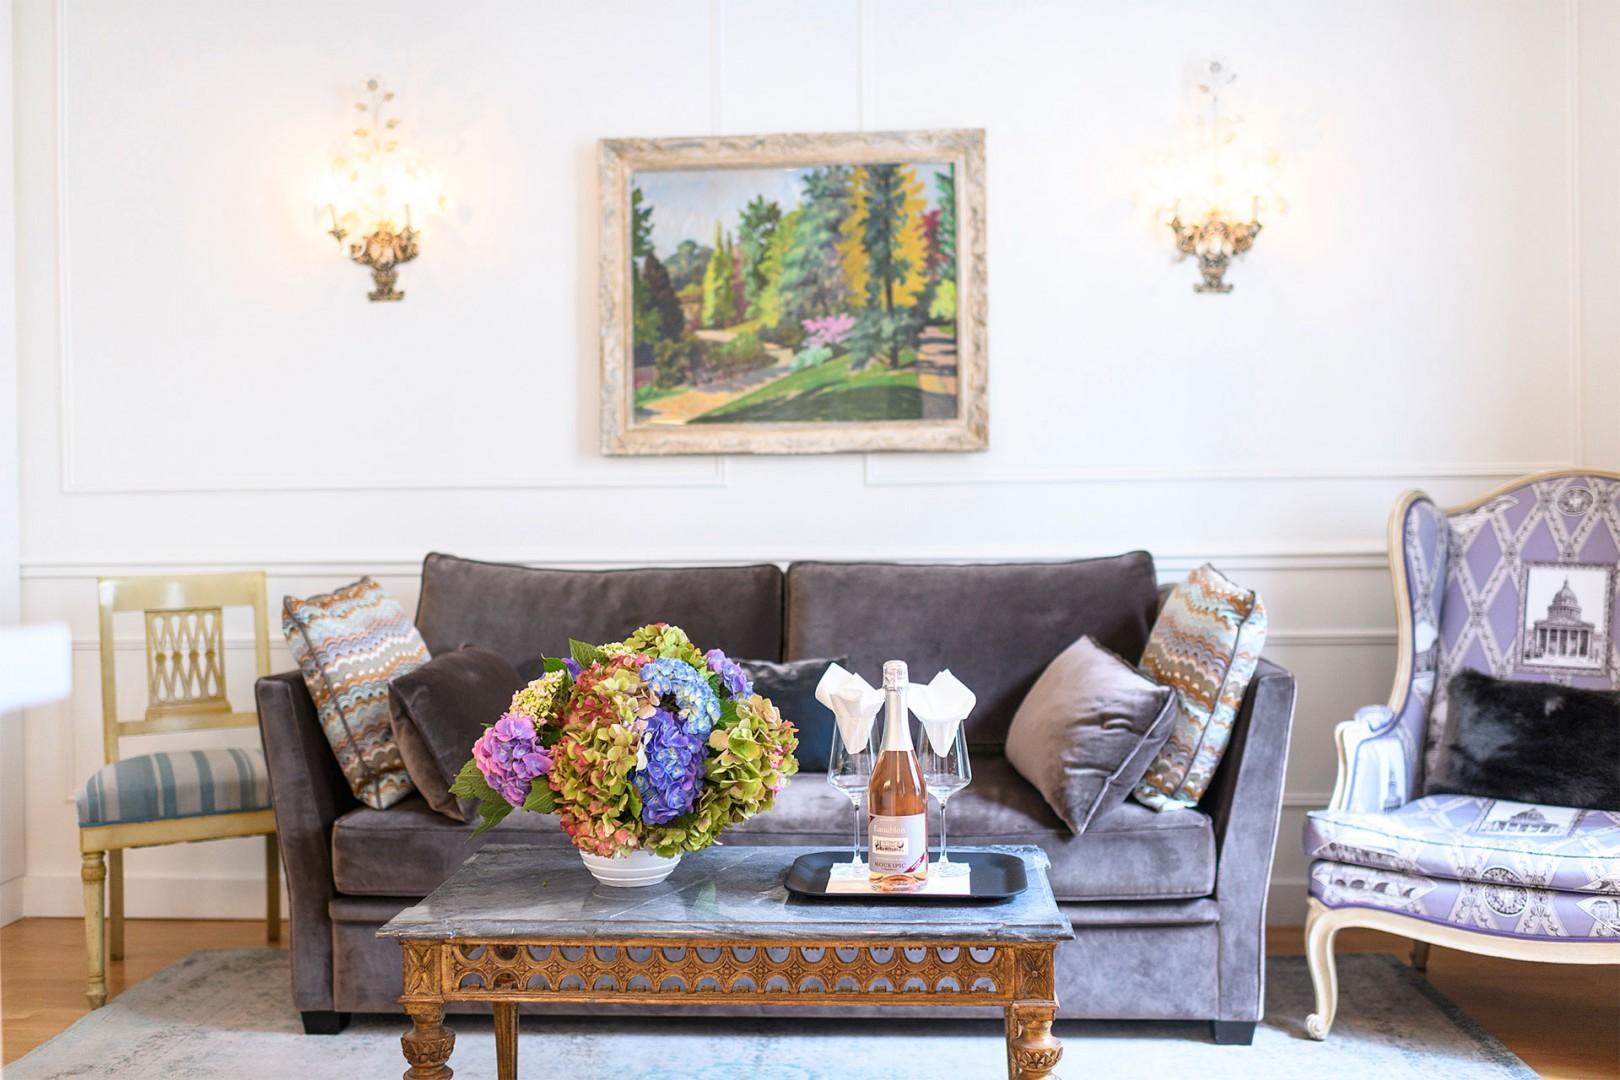 Relax in the elegant living room.